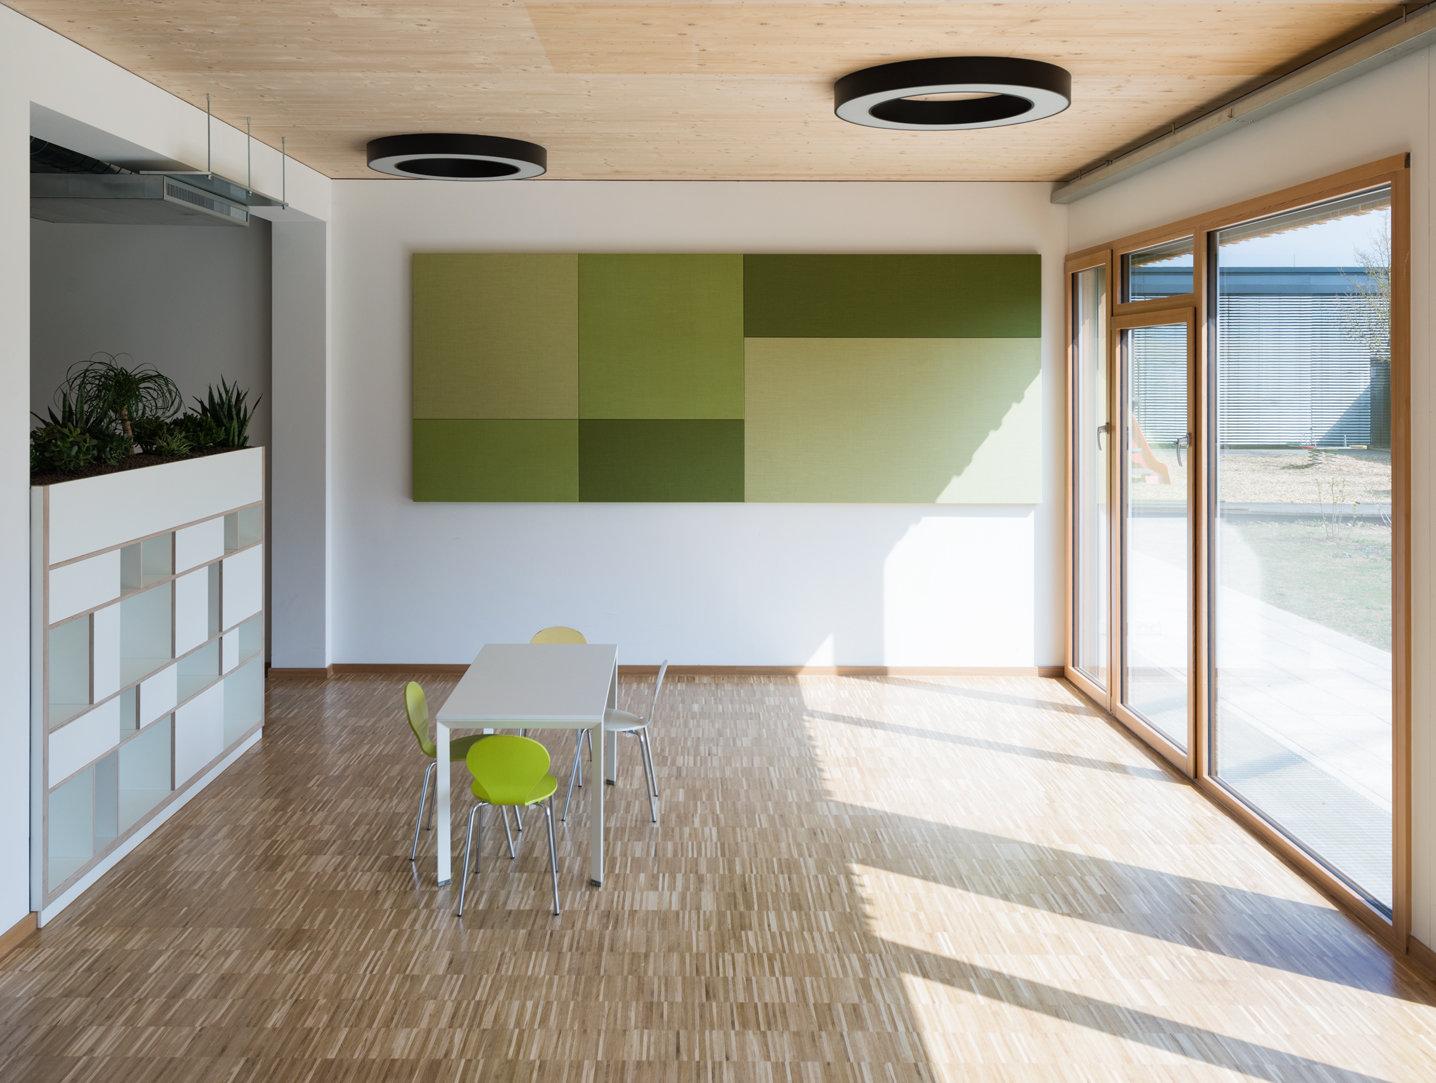 ERNE Holzbau Kindergarten Luxemburg Modulbauweise